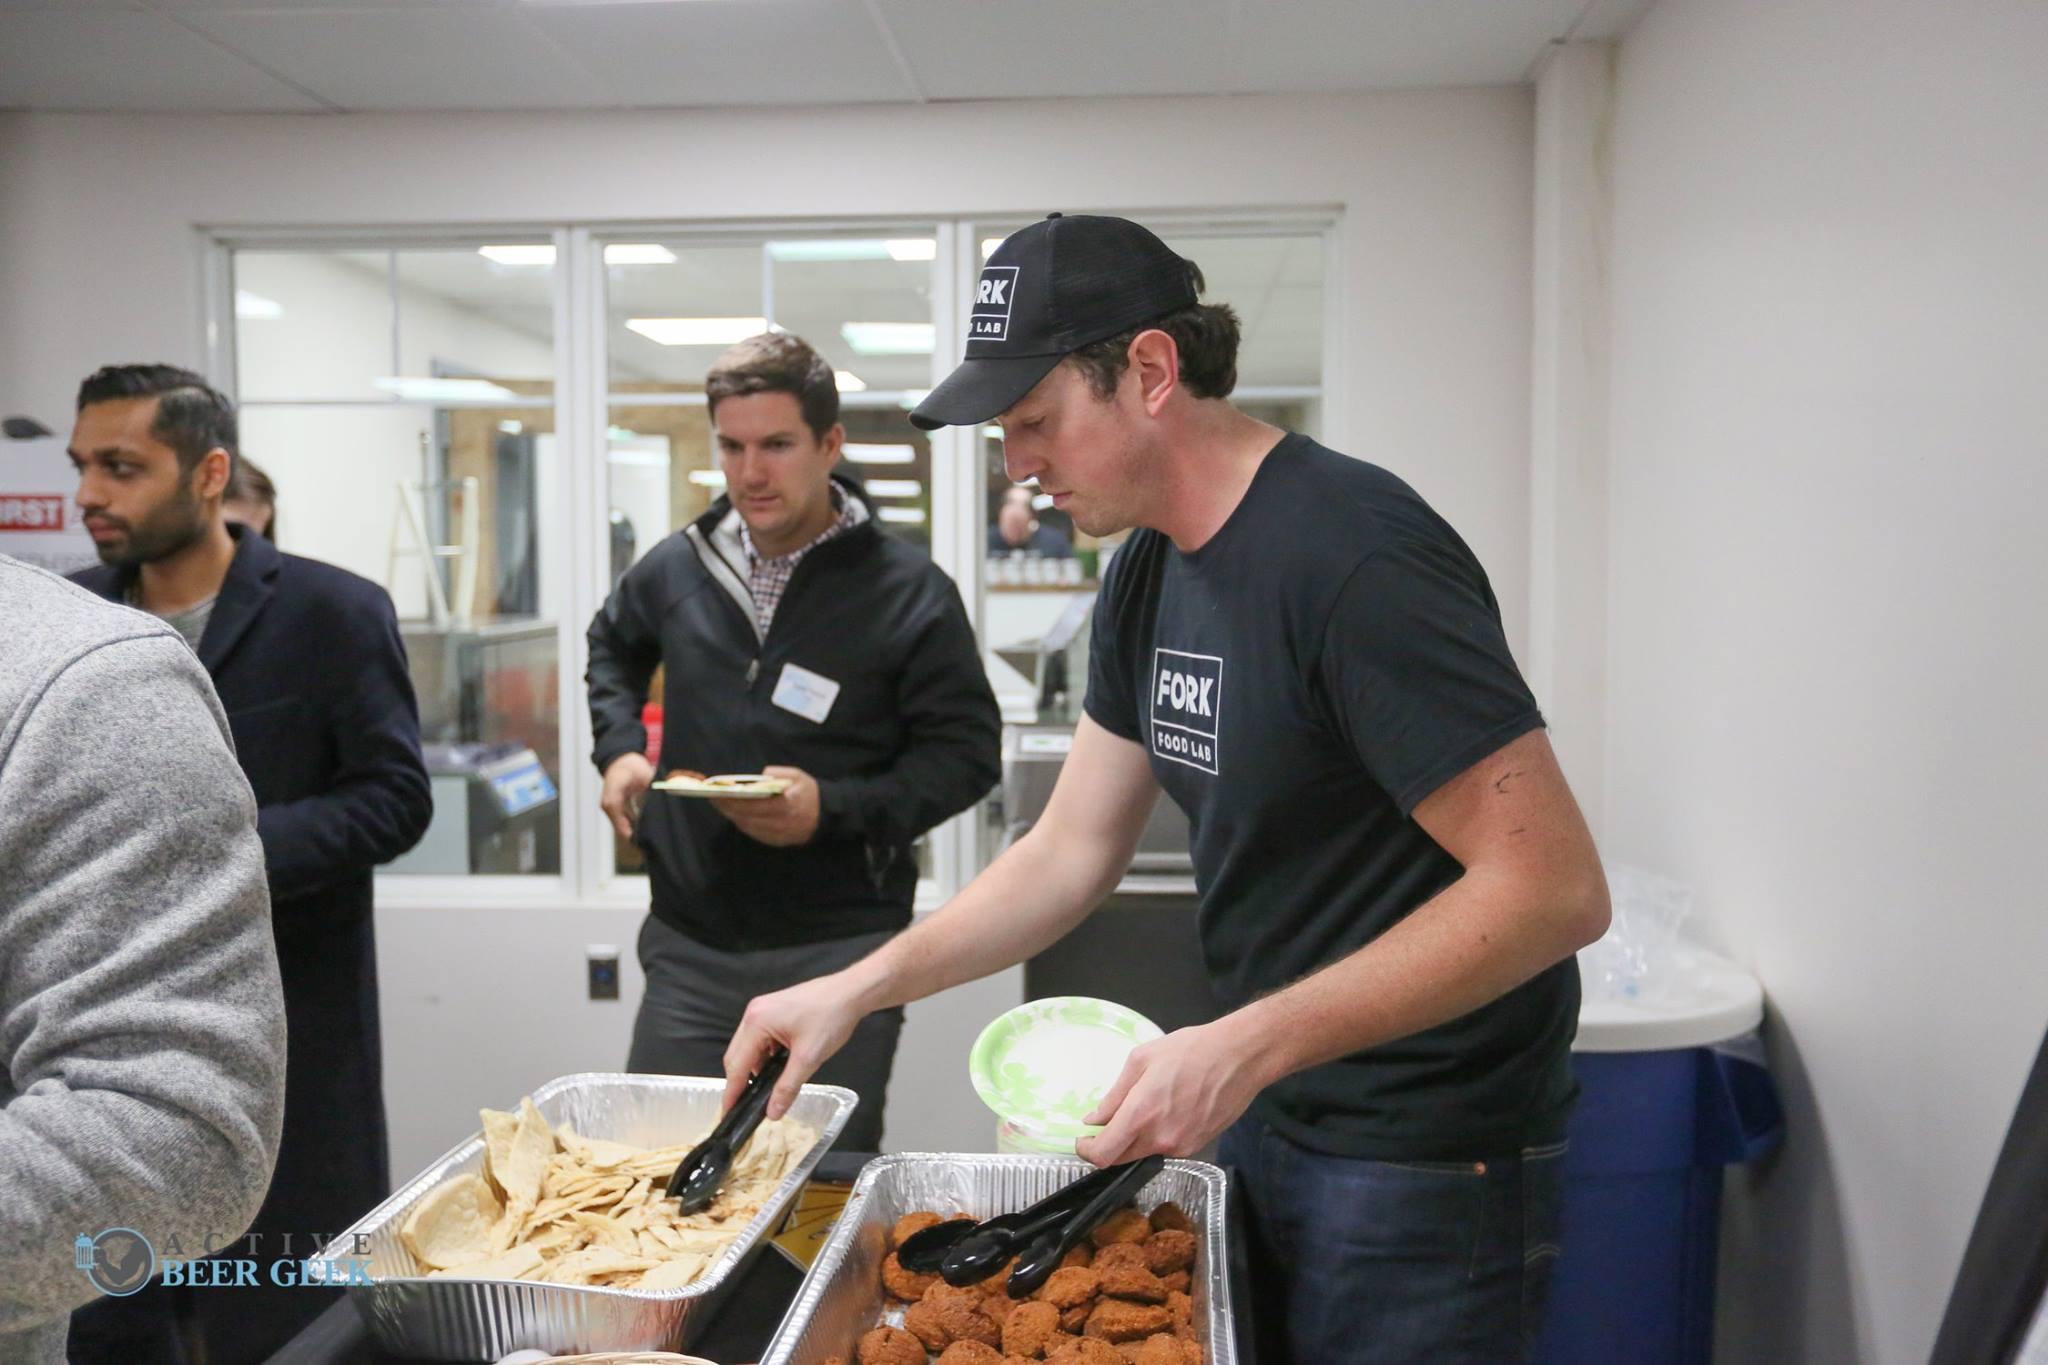 Eric Holstein of Fork Food Lab